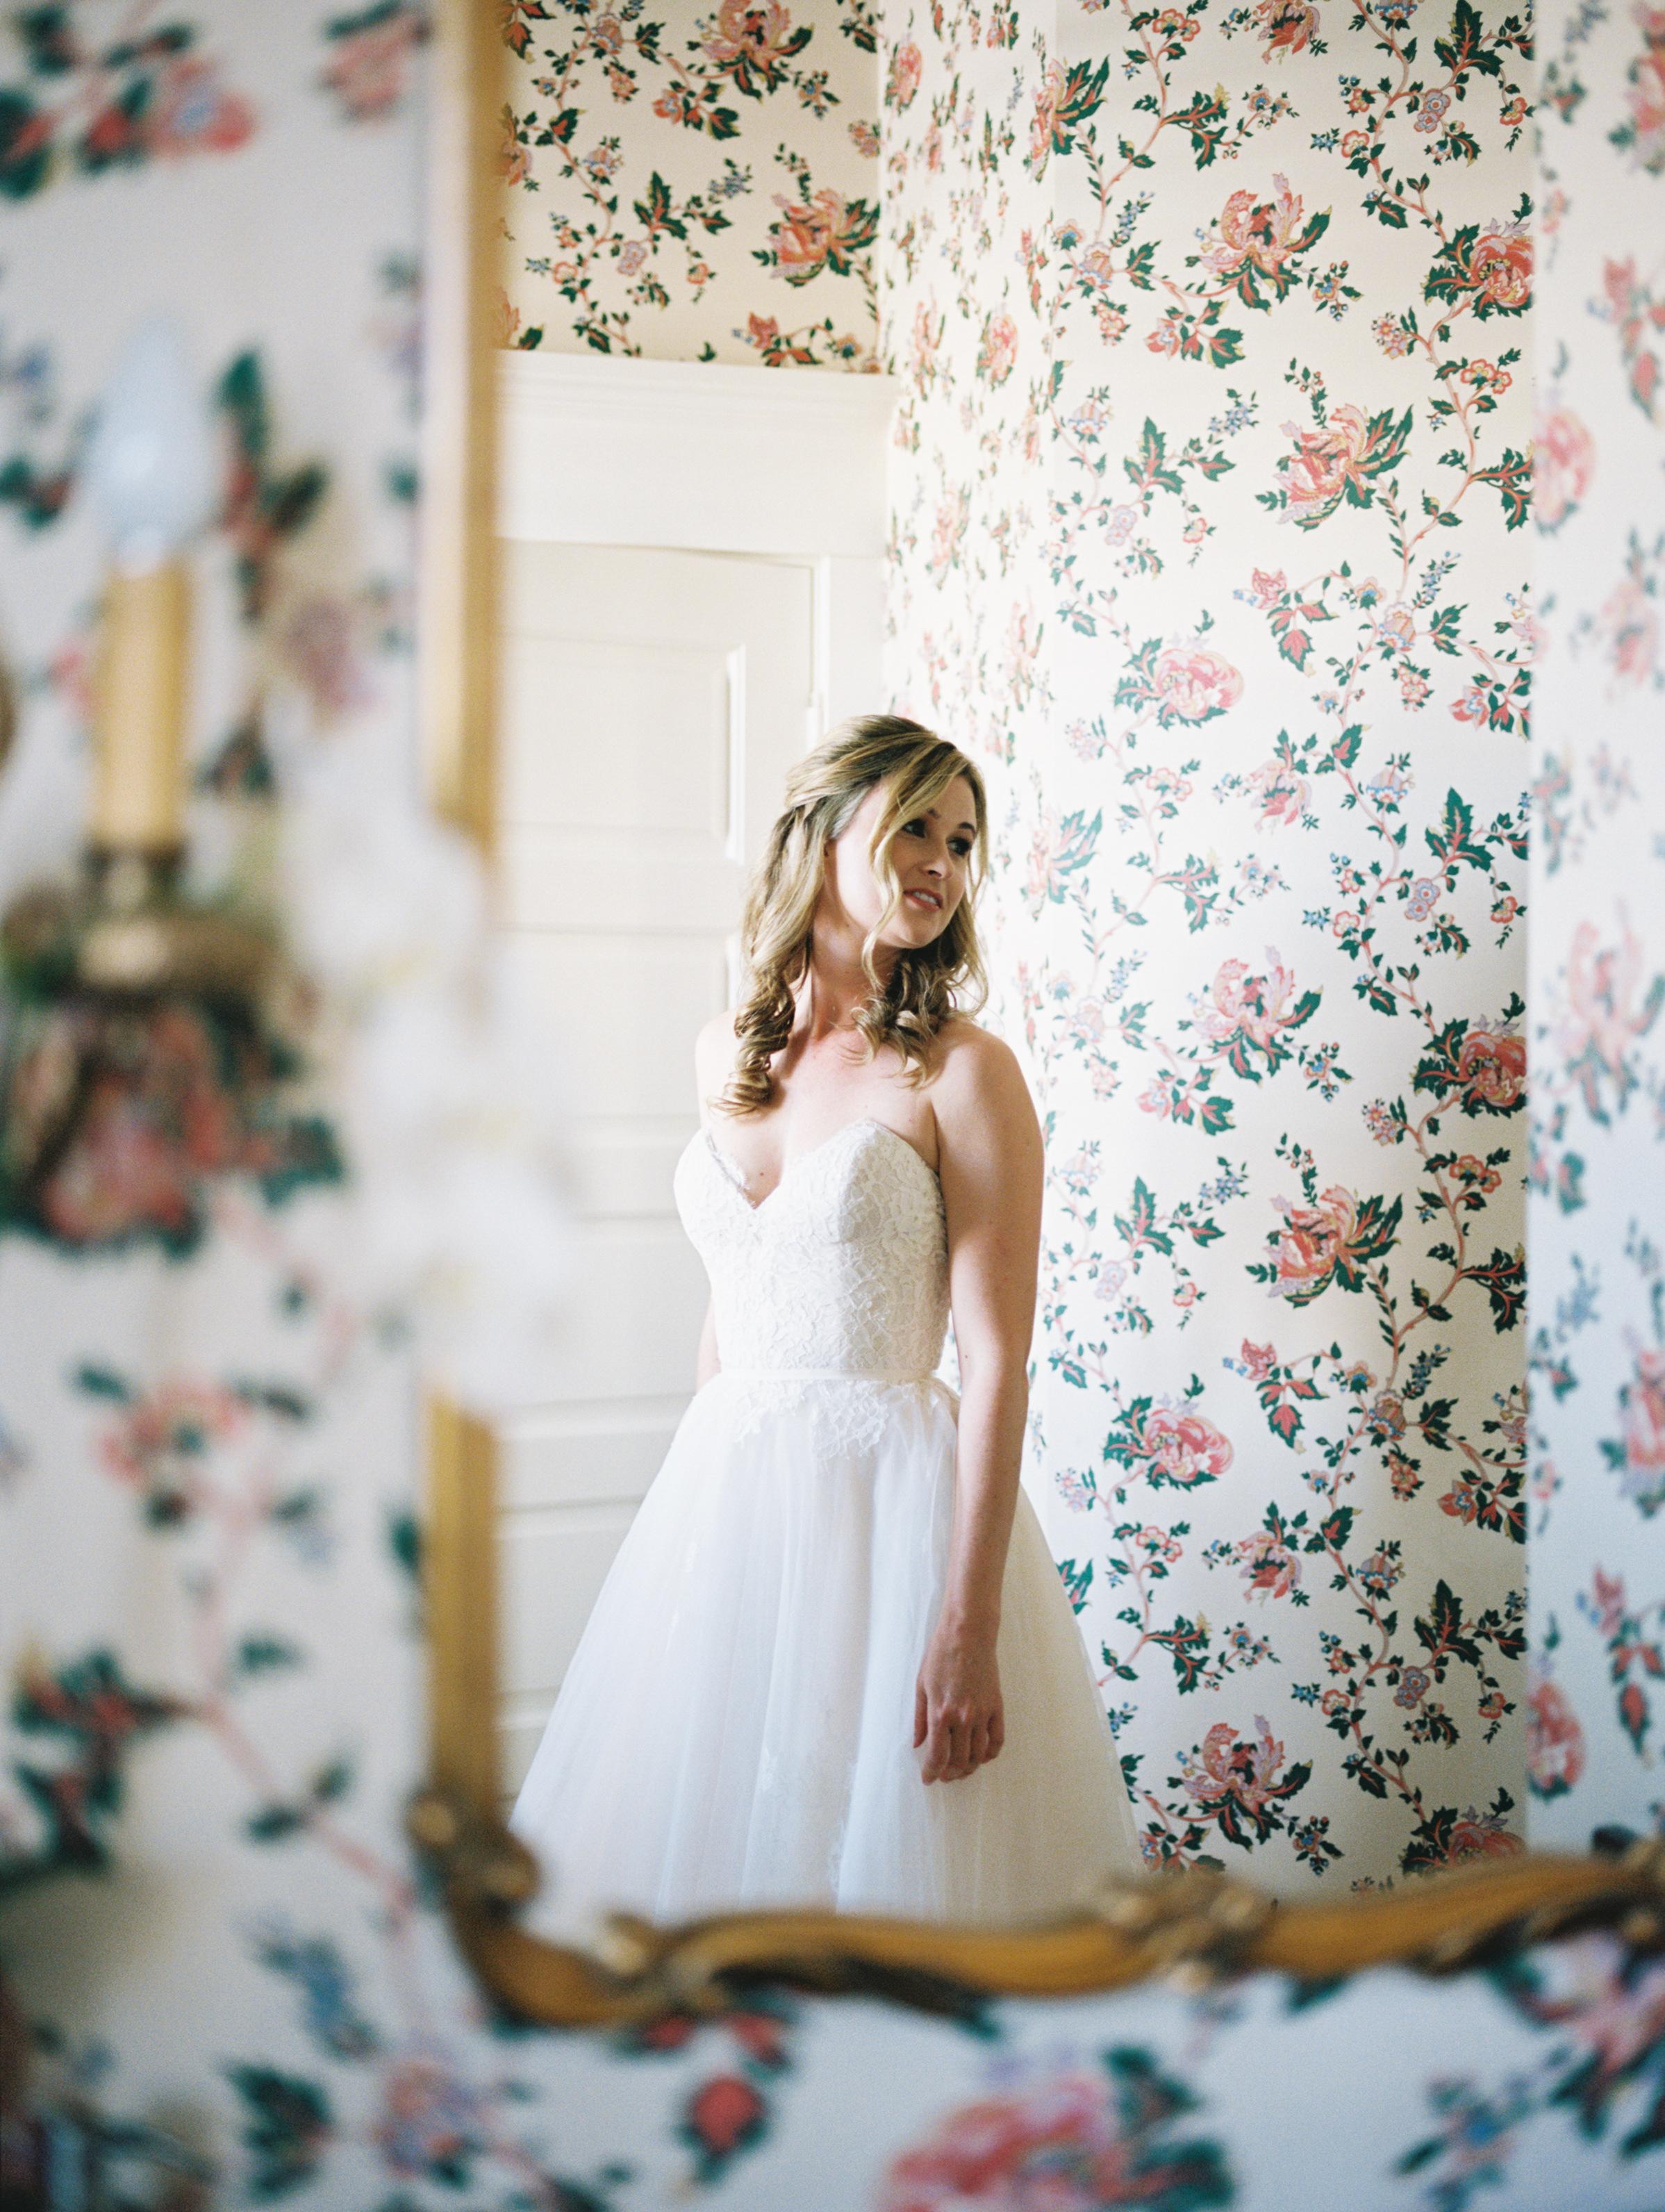 www.santabarbarawedding.com | Ryanne Bee Photography | The Santa Barbara Club | Monique L'Huillier | Carlyle Salon | Bride Before the Ceremony